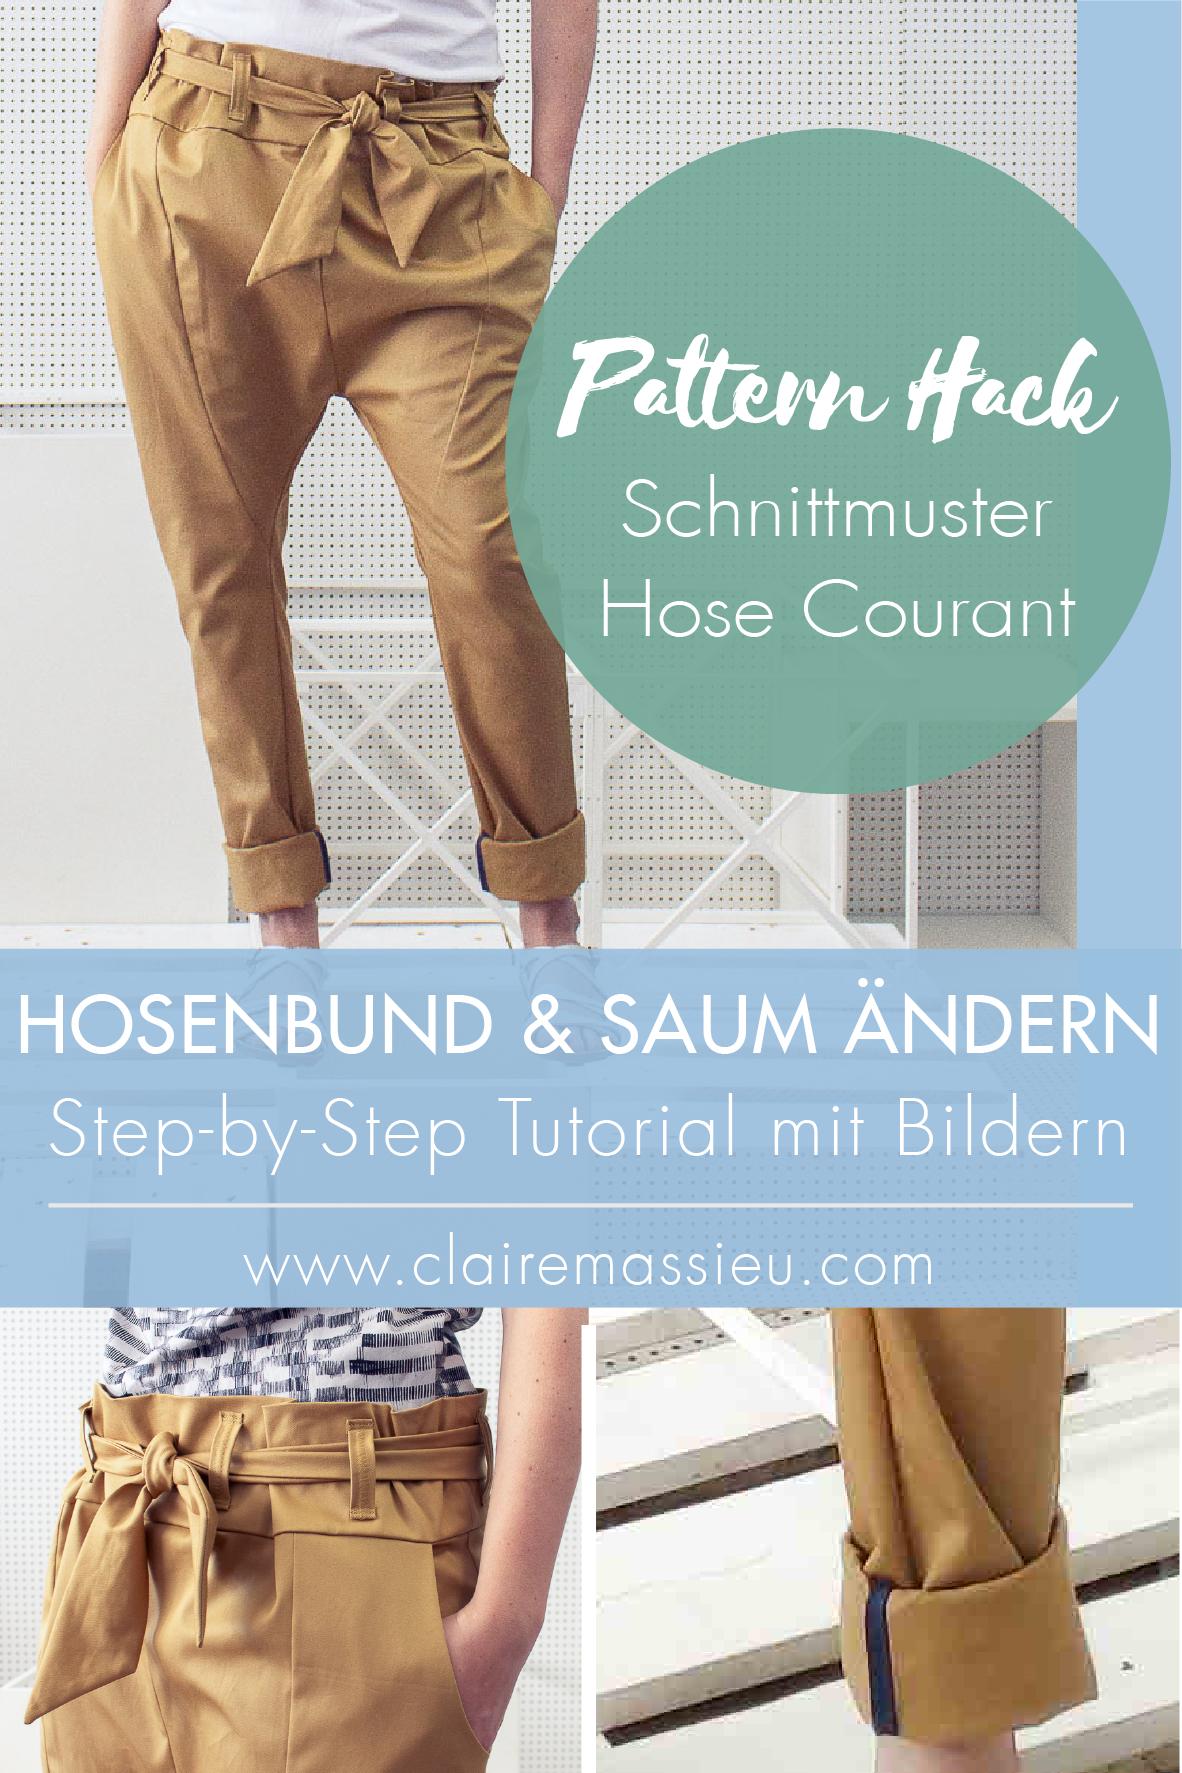 patternhack-hose-courant-pinterest